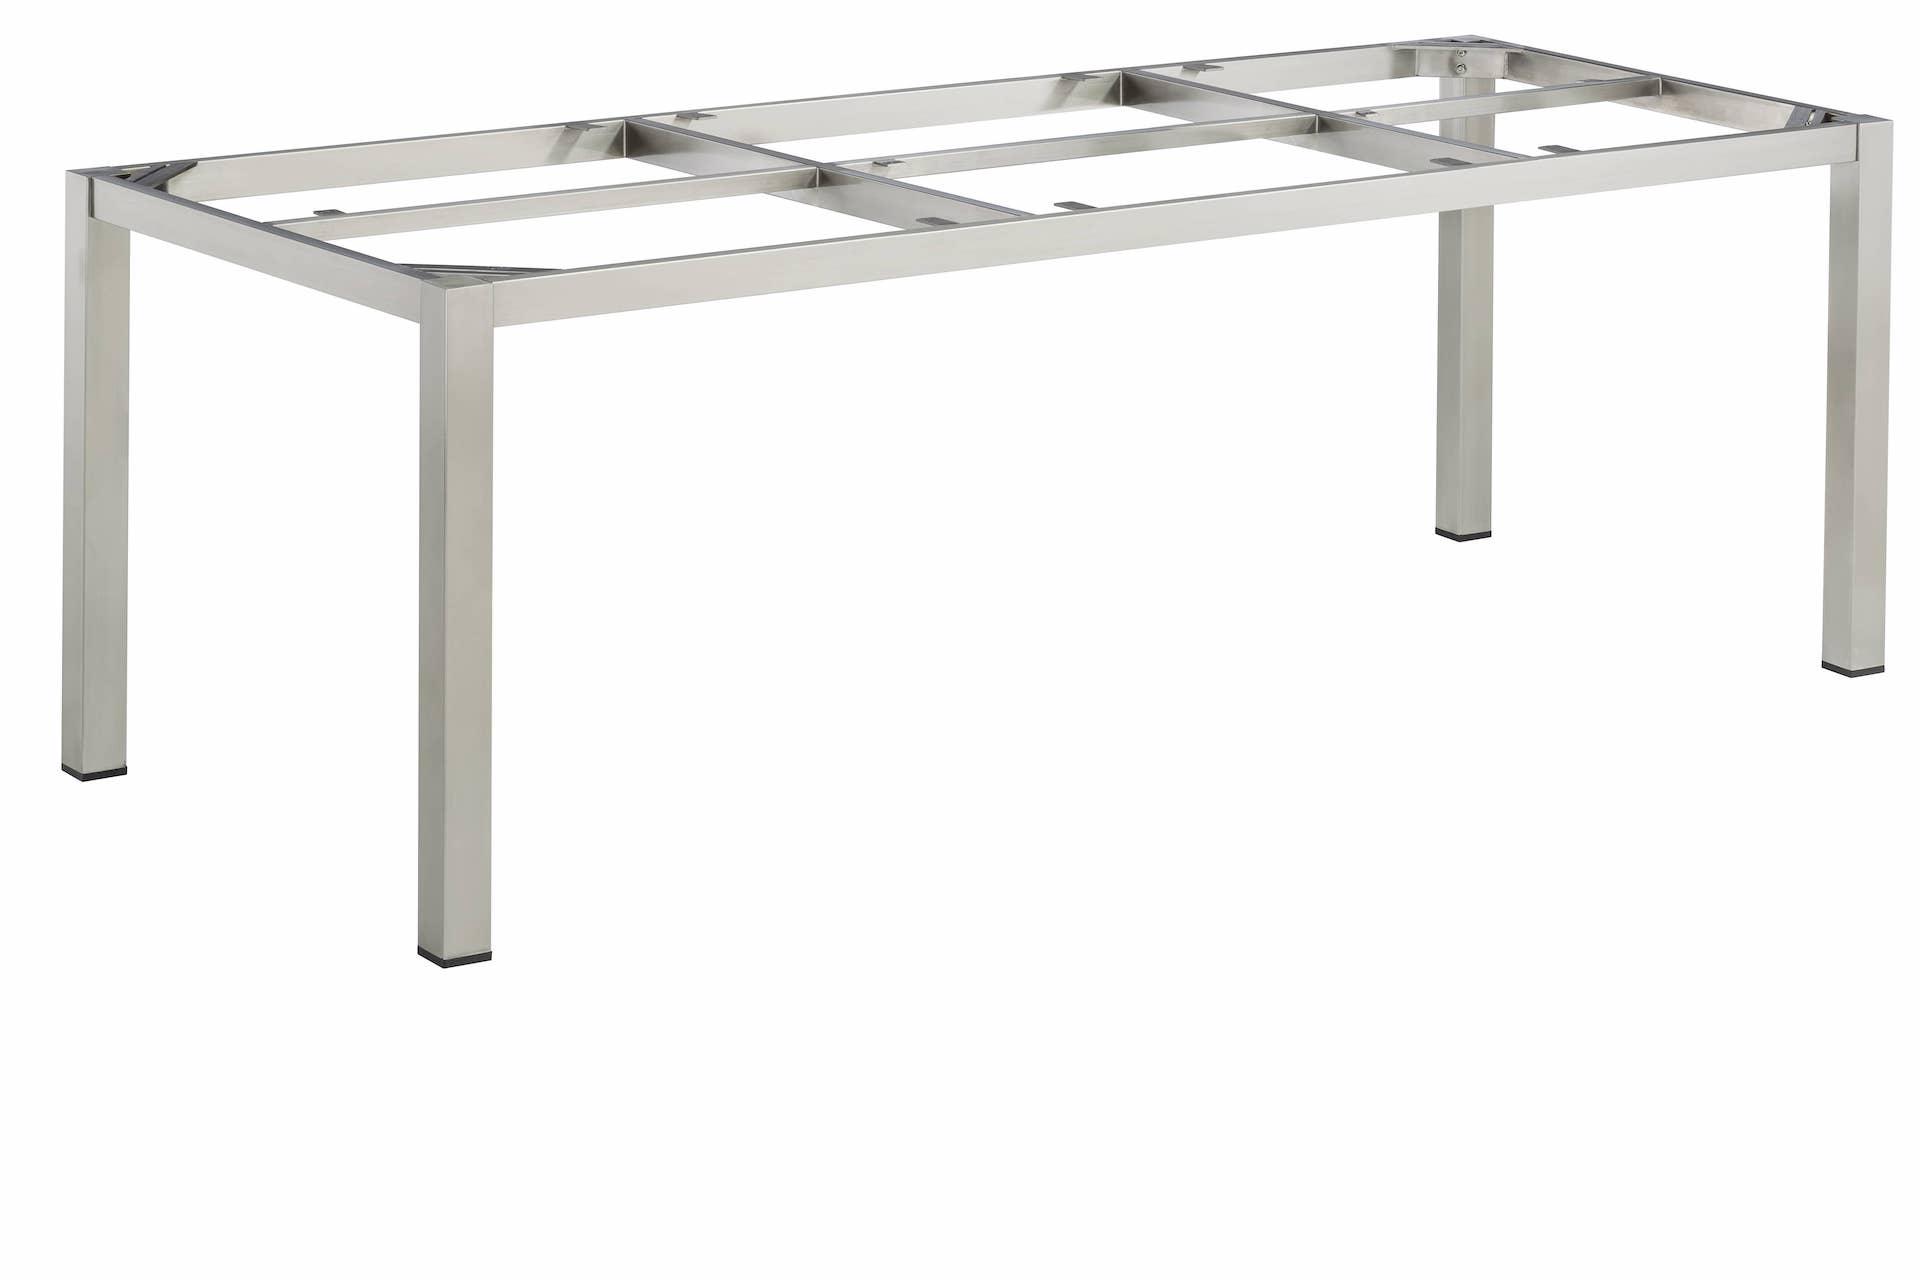 CUBIC Edelstahl Tischgestell 220 x 95 x 72 cm